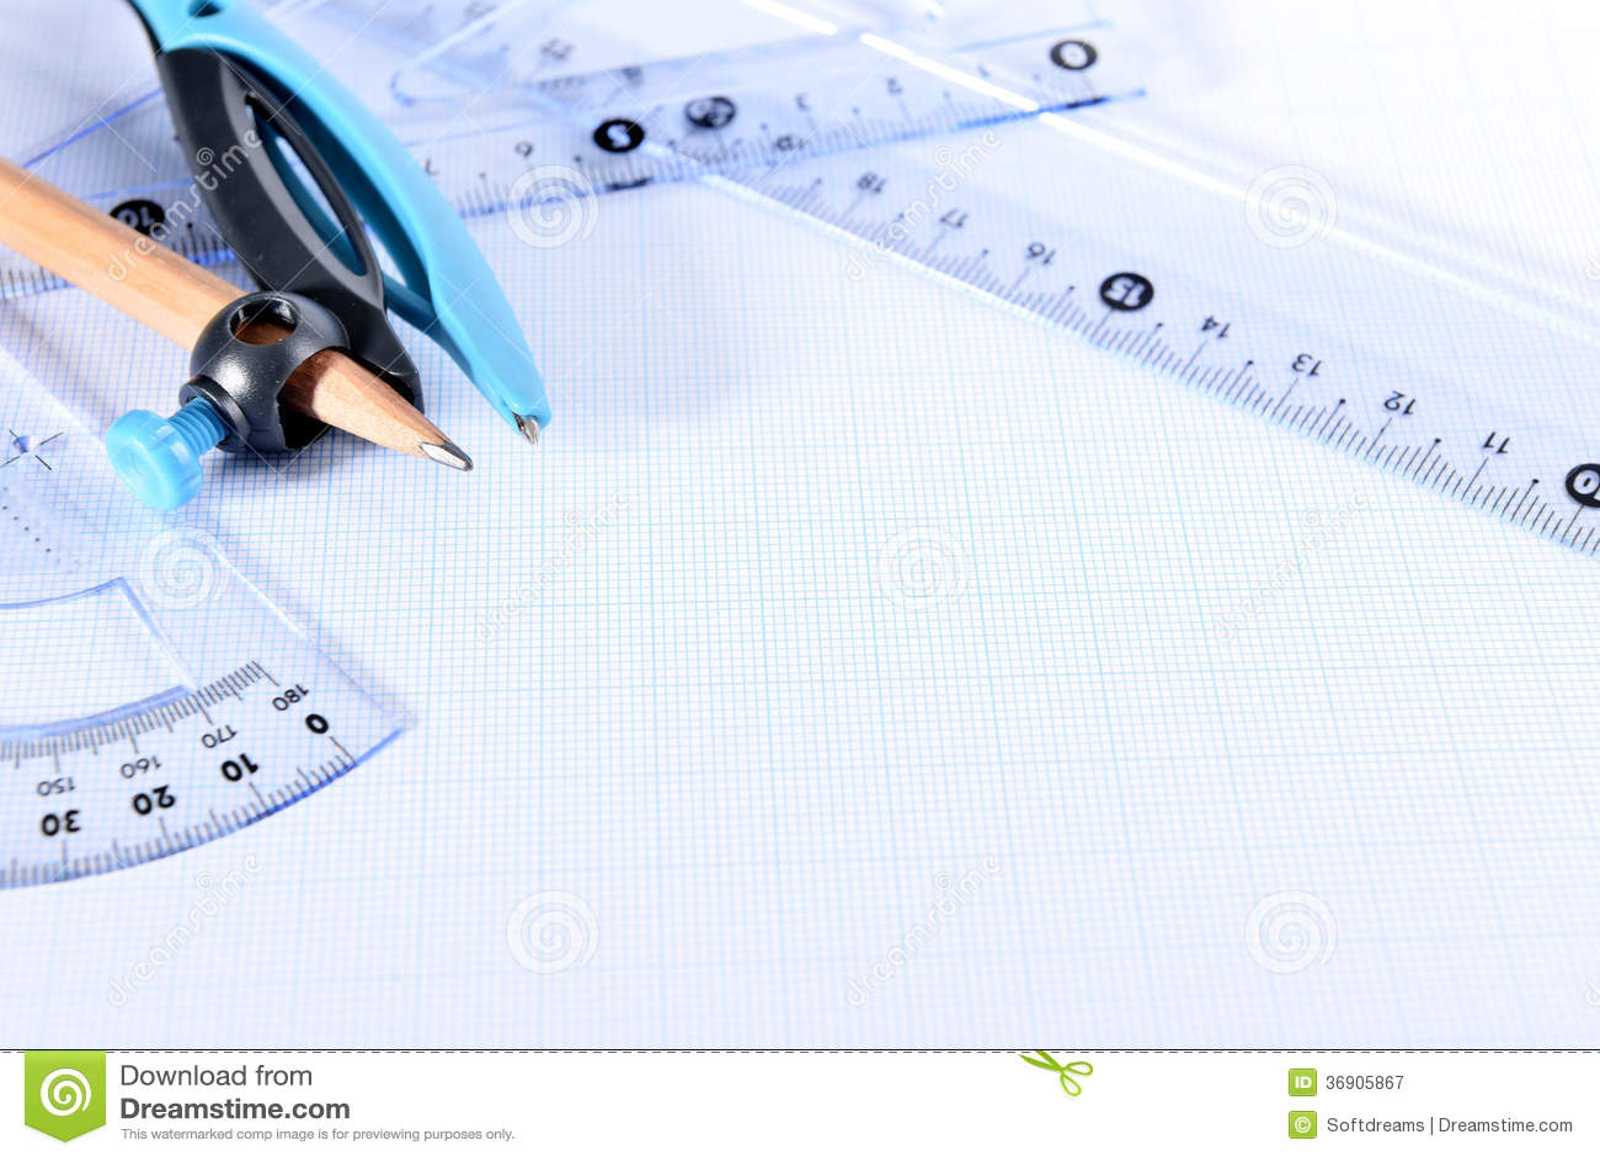 graph paper stock image image of circle idea drawing 36905867